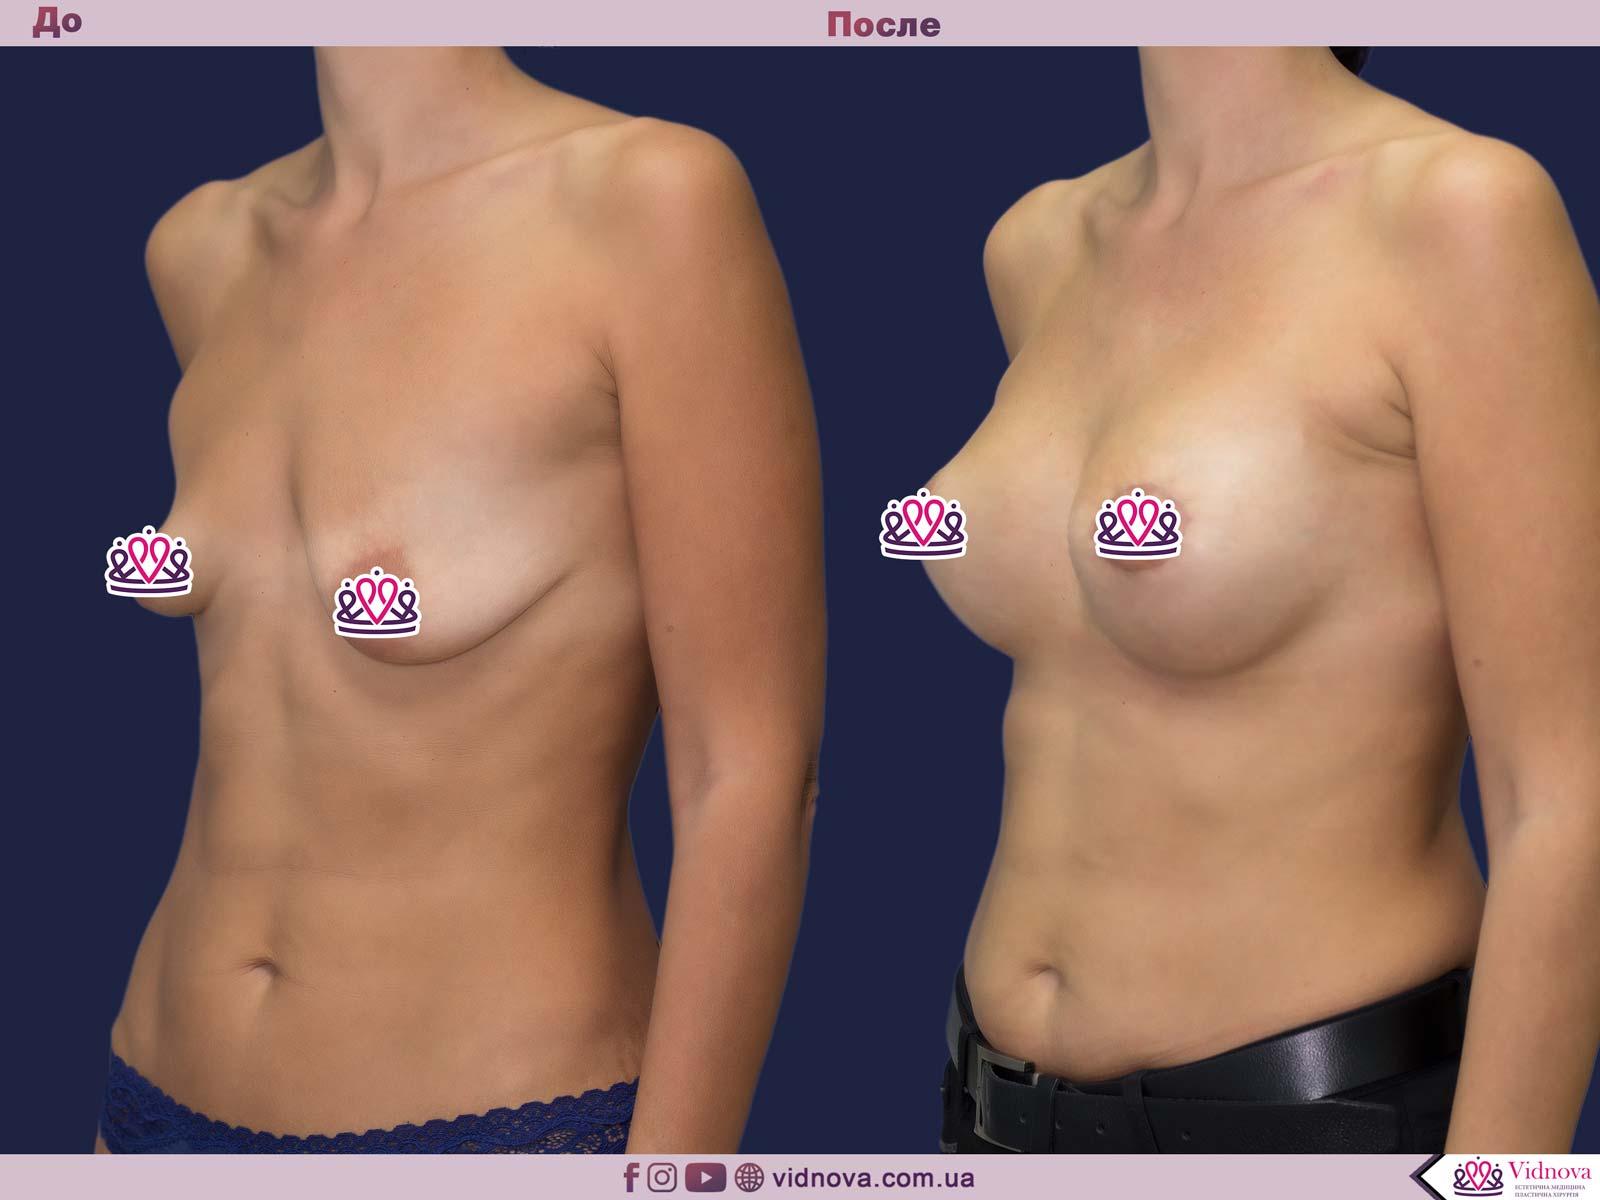 Увеличение груди: Фото ДО и ПОСЛЕ - Пример №68-2 - Клиника Vidnova